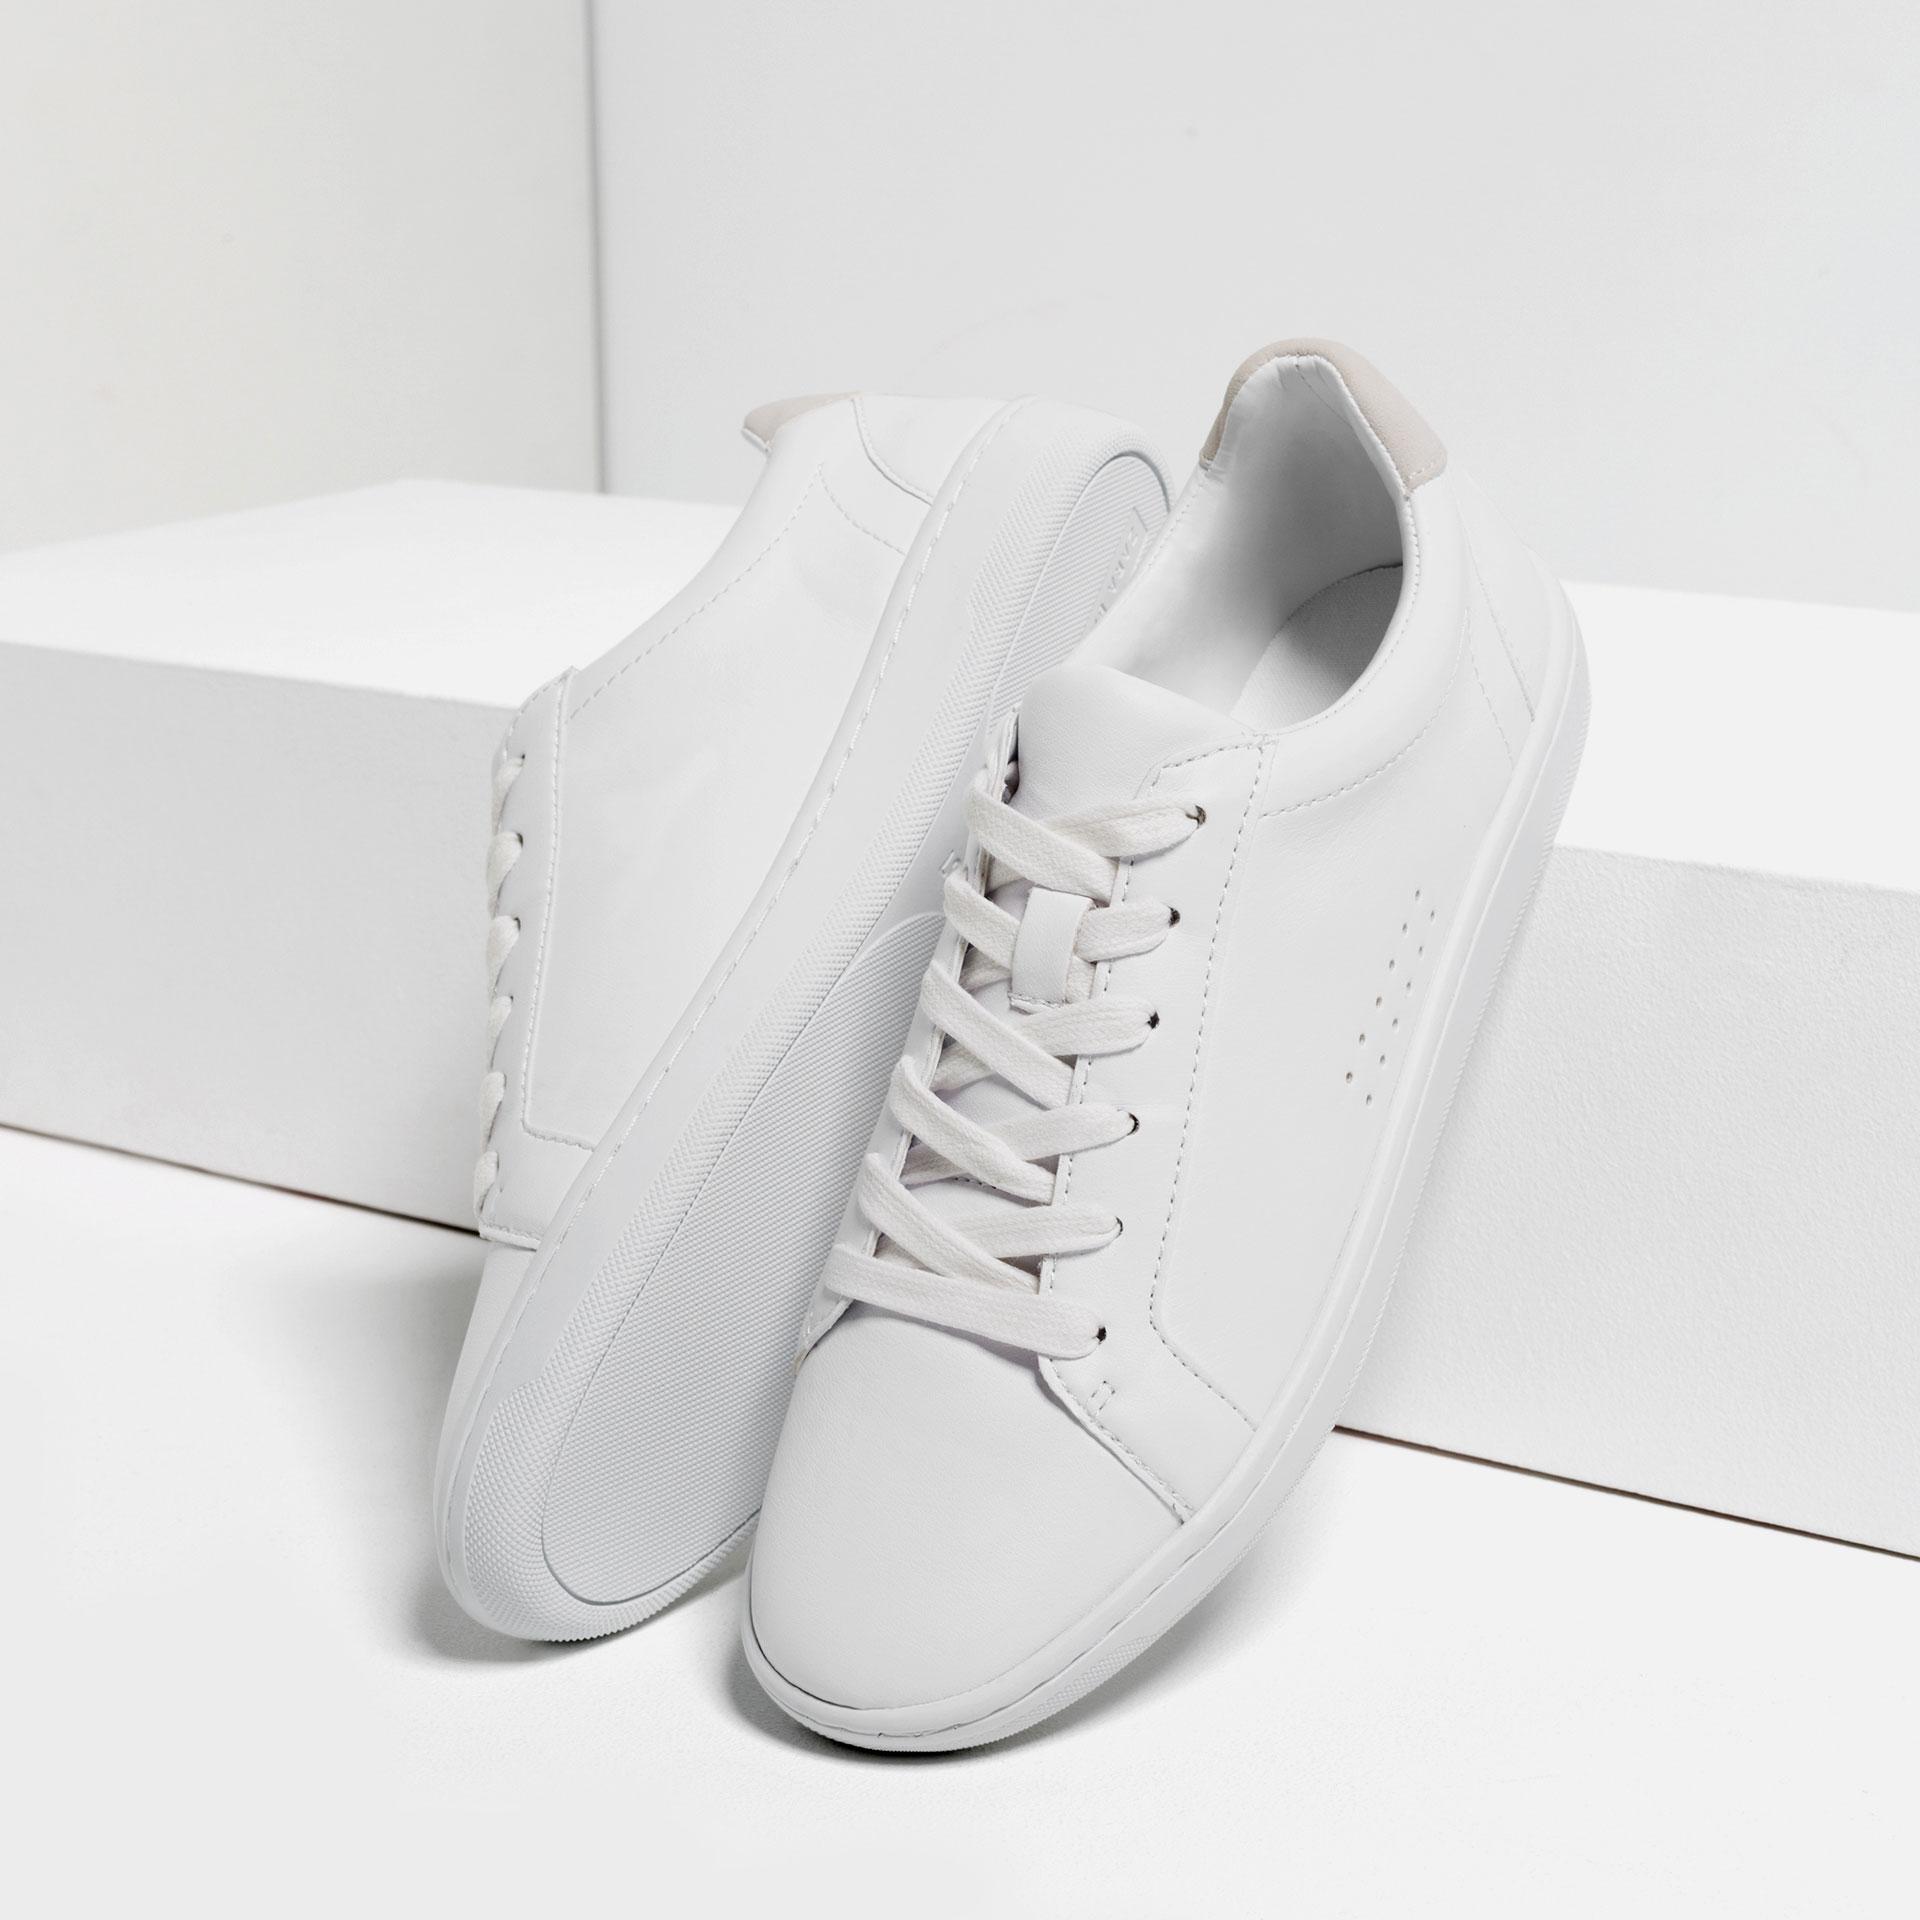 зара обувь